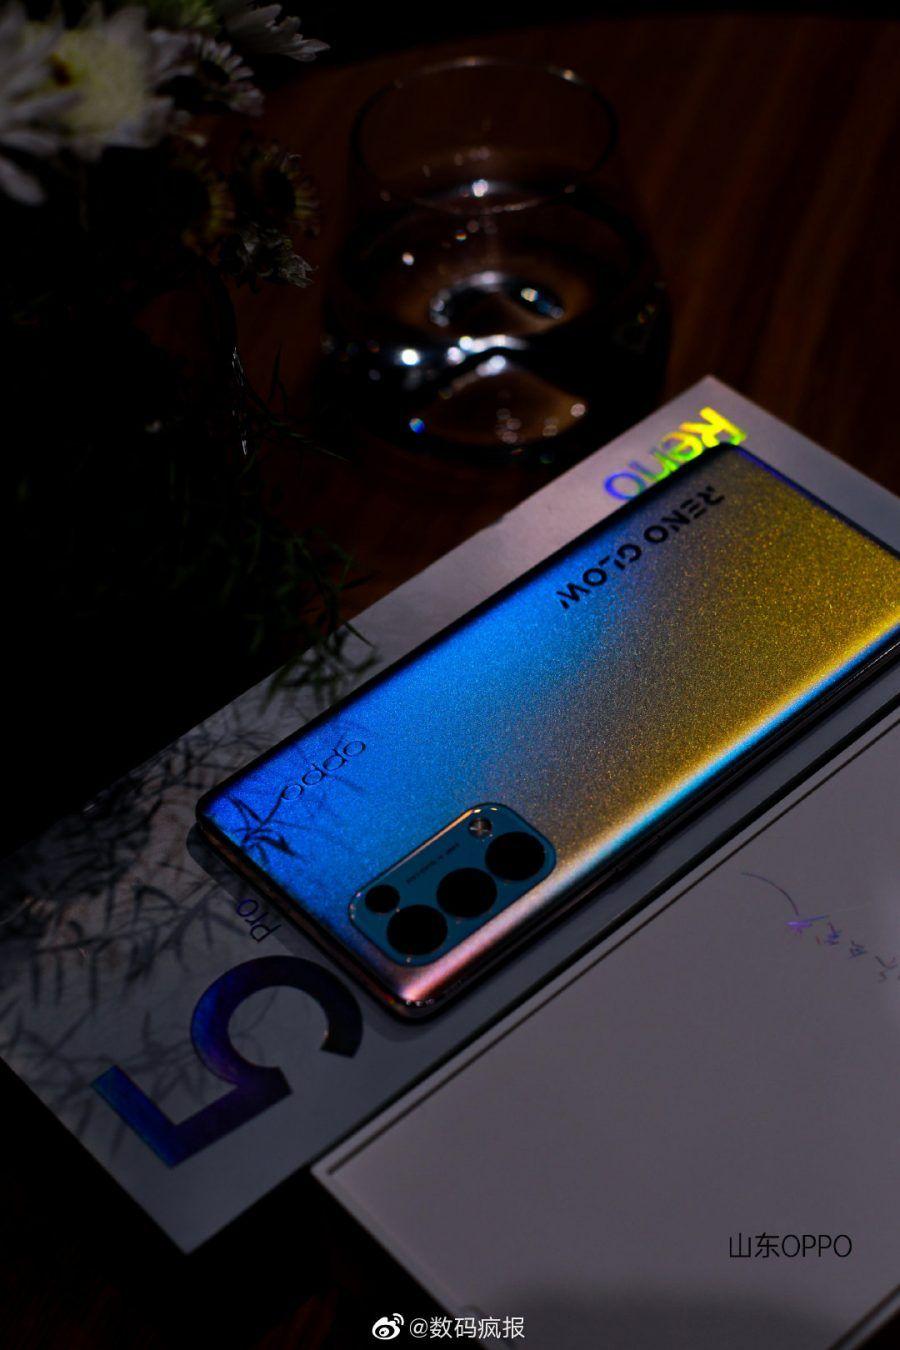 Reno5Pro 7 Android 11, china, gama-média, imagens reais, oppo, OPPO Reno 5, Reno 5 Pro, smartphone, topo de gama